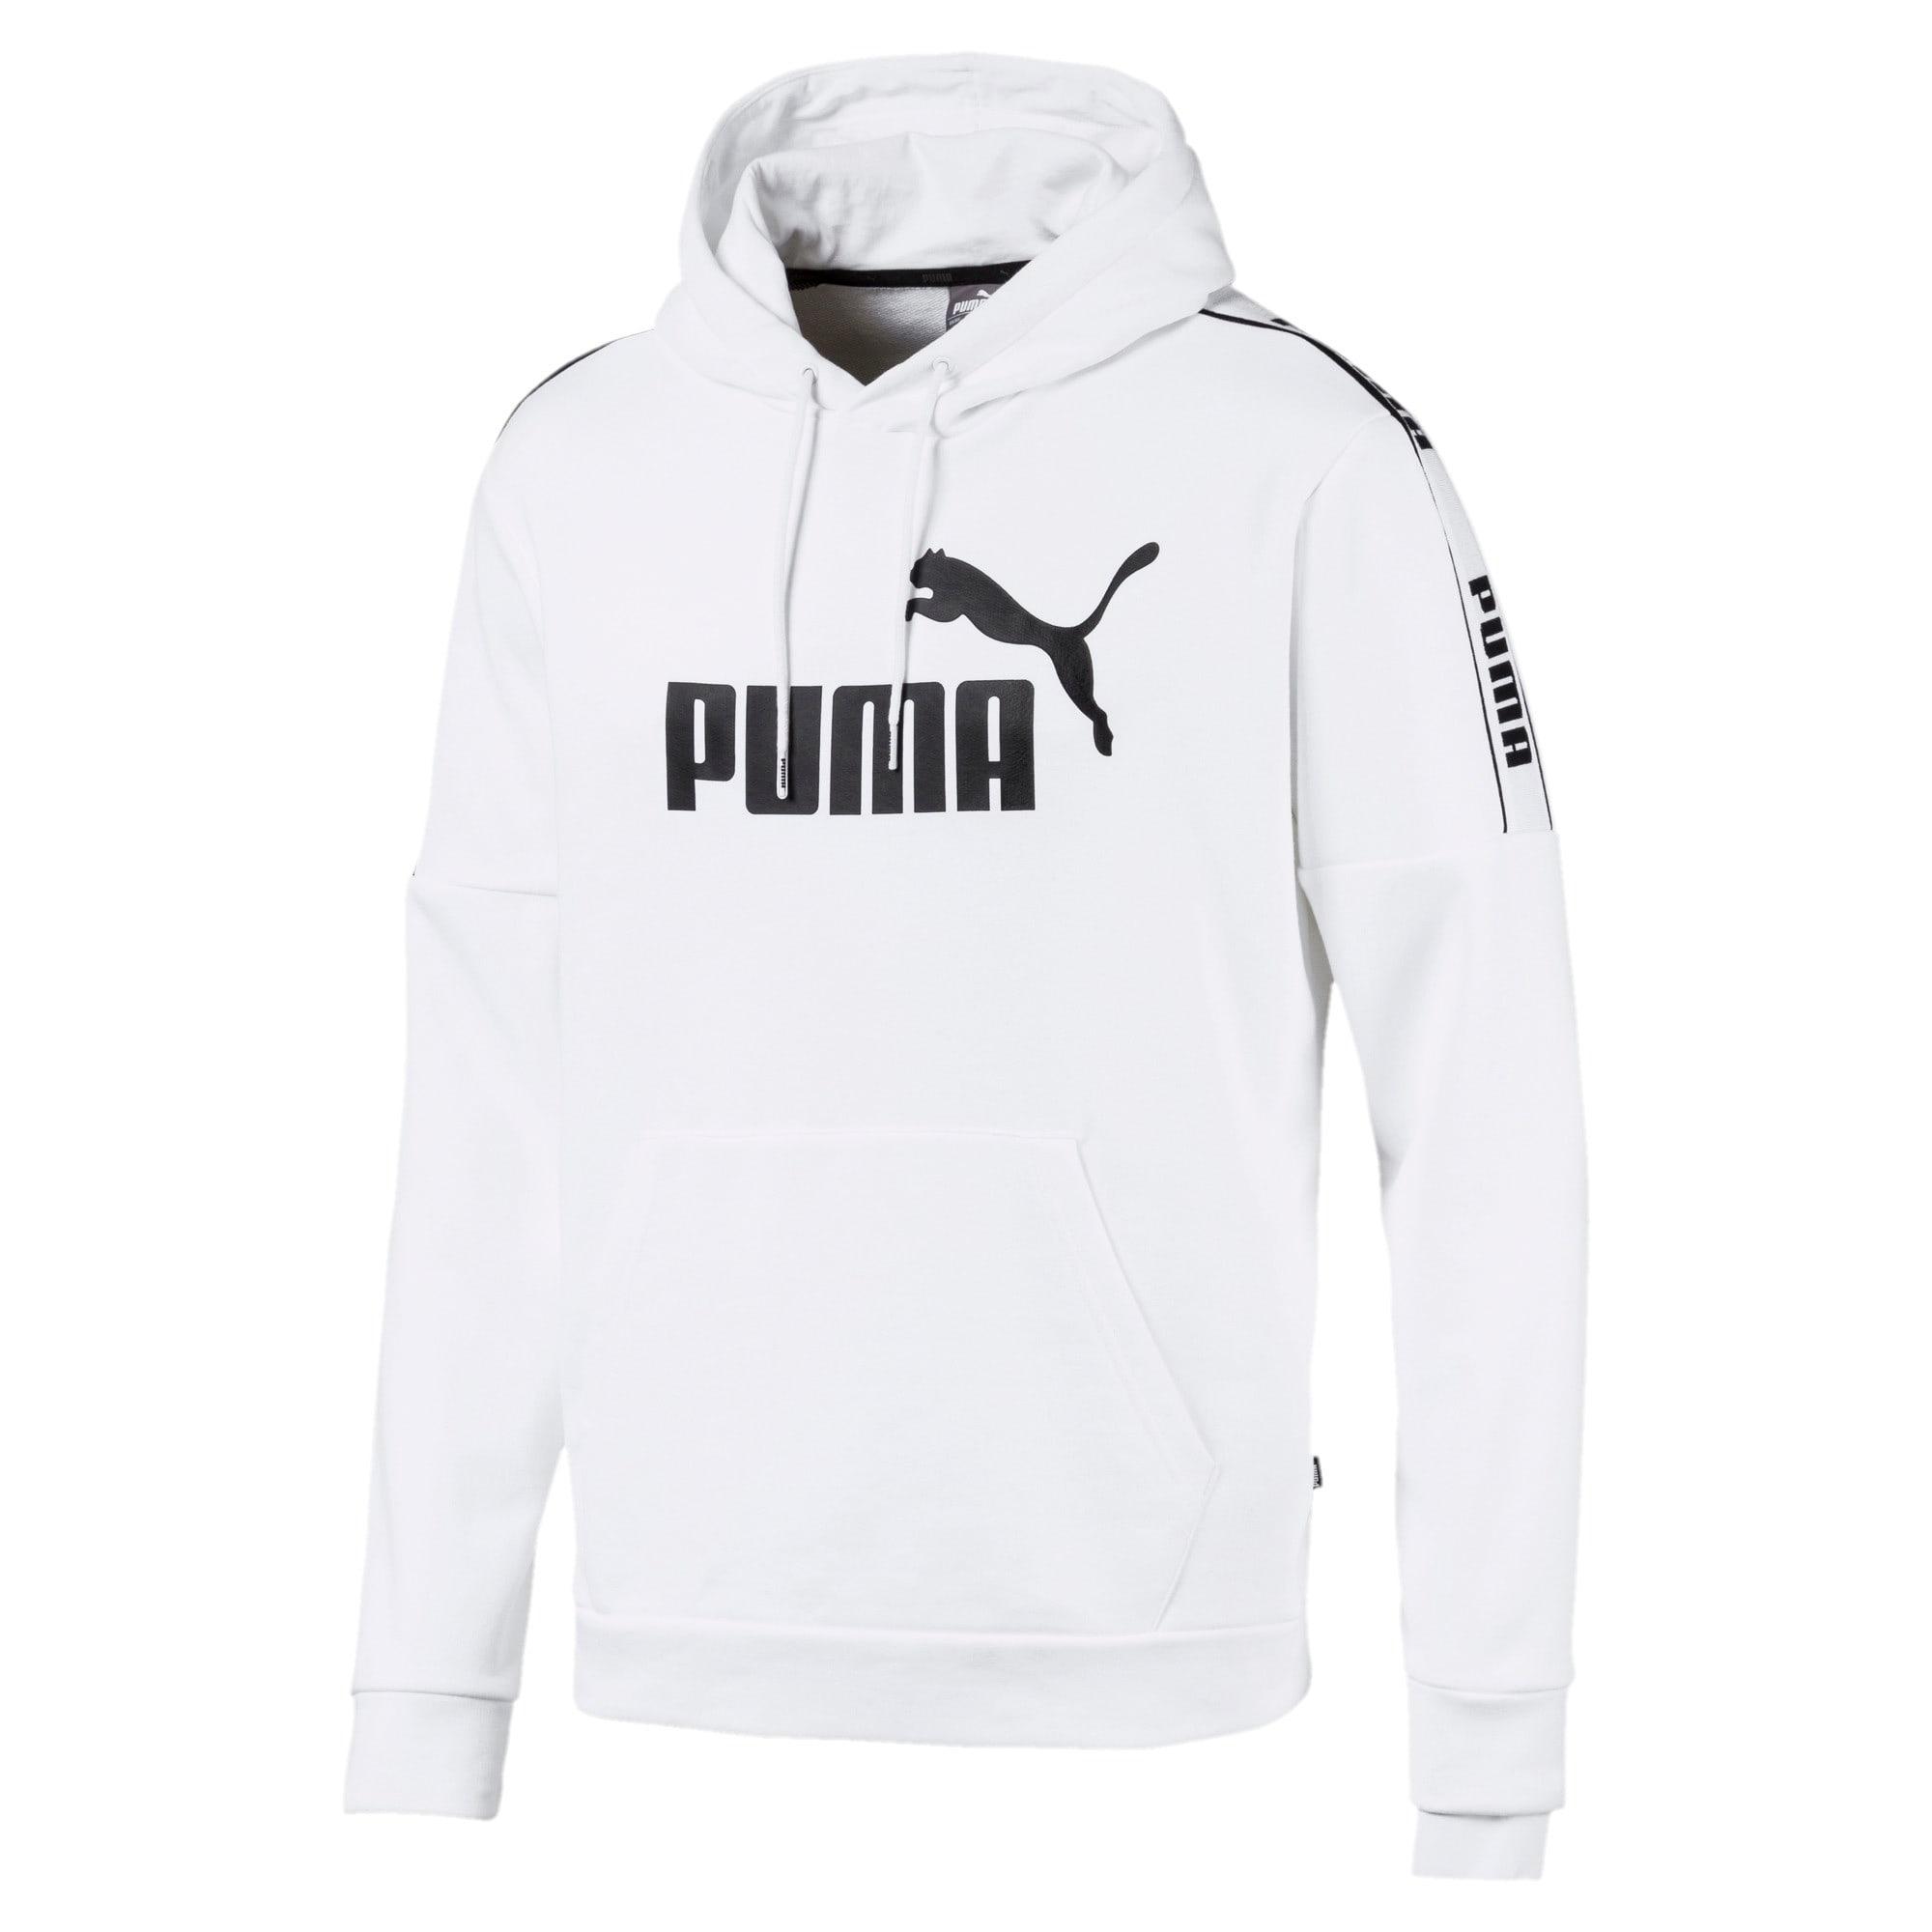 Thumbnail 1 of Amplified Men's Hoodie, Puma White, medium